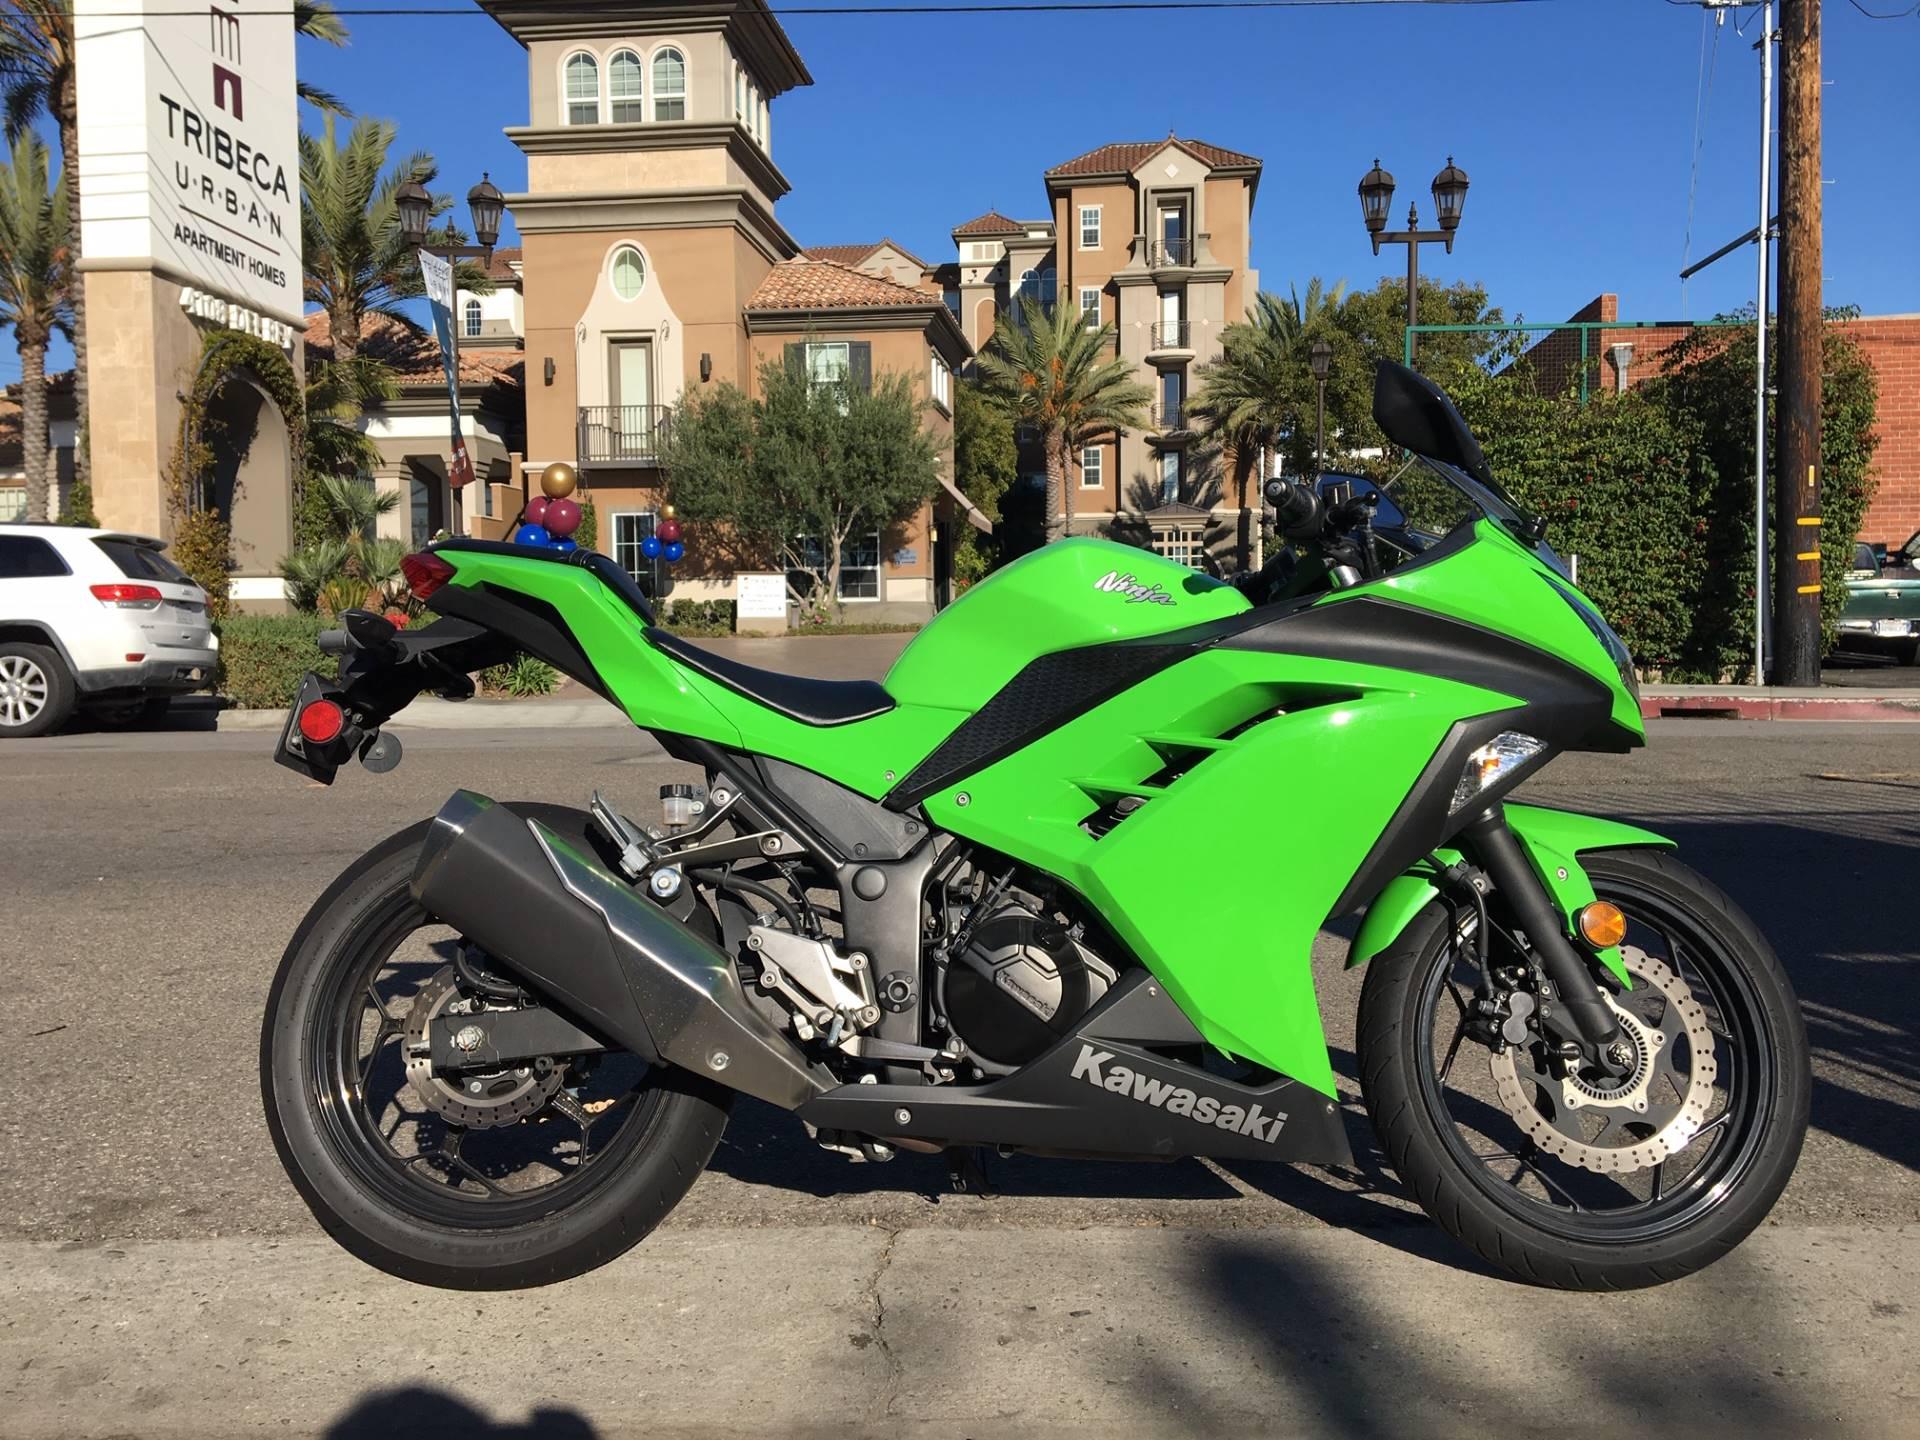 2015 Kawasaki Ninja 300 Abs Motorcycles Marina Del Rey California